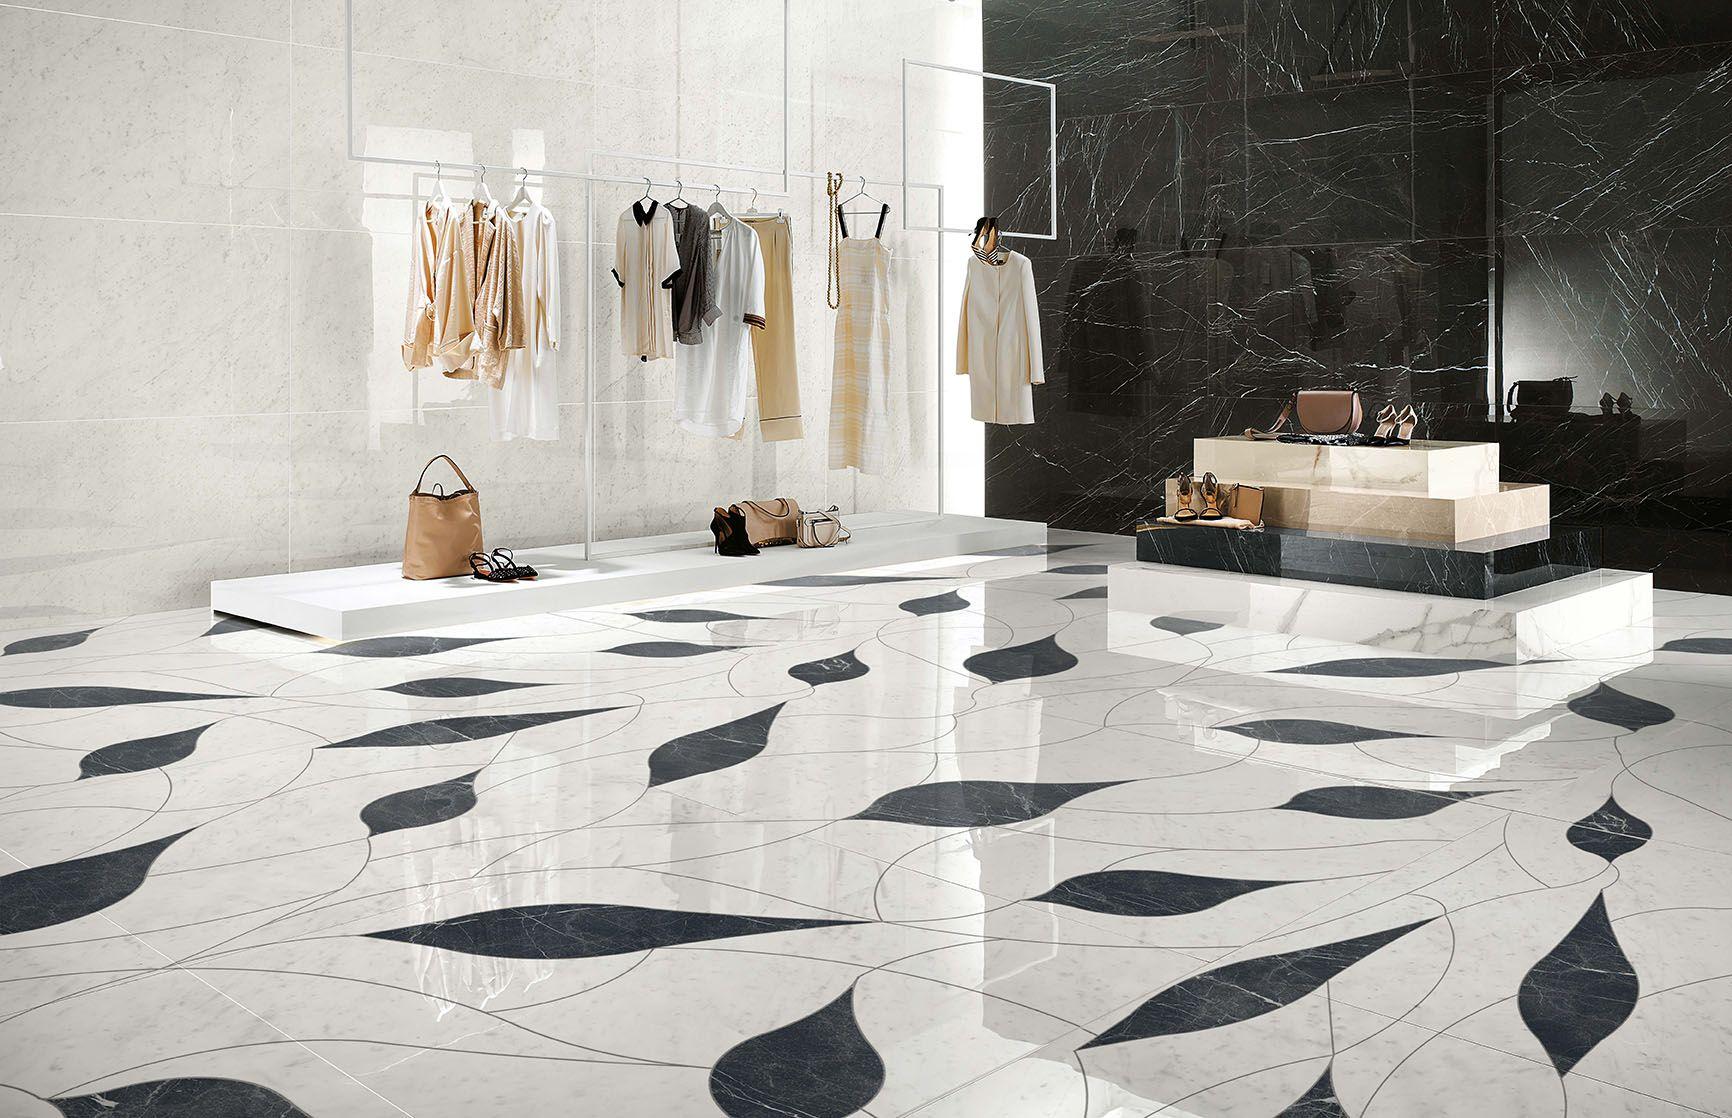 Roma Diamond Fap Ceramiche roma diamond #fapceramiche #fapstyle #madeinfap #tiles